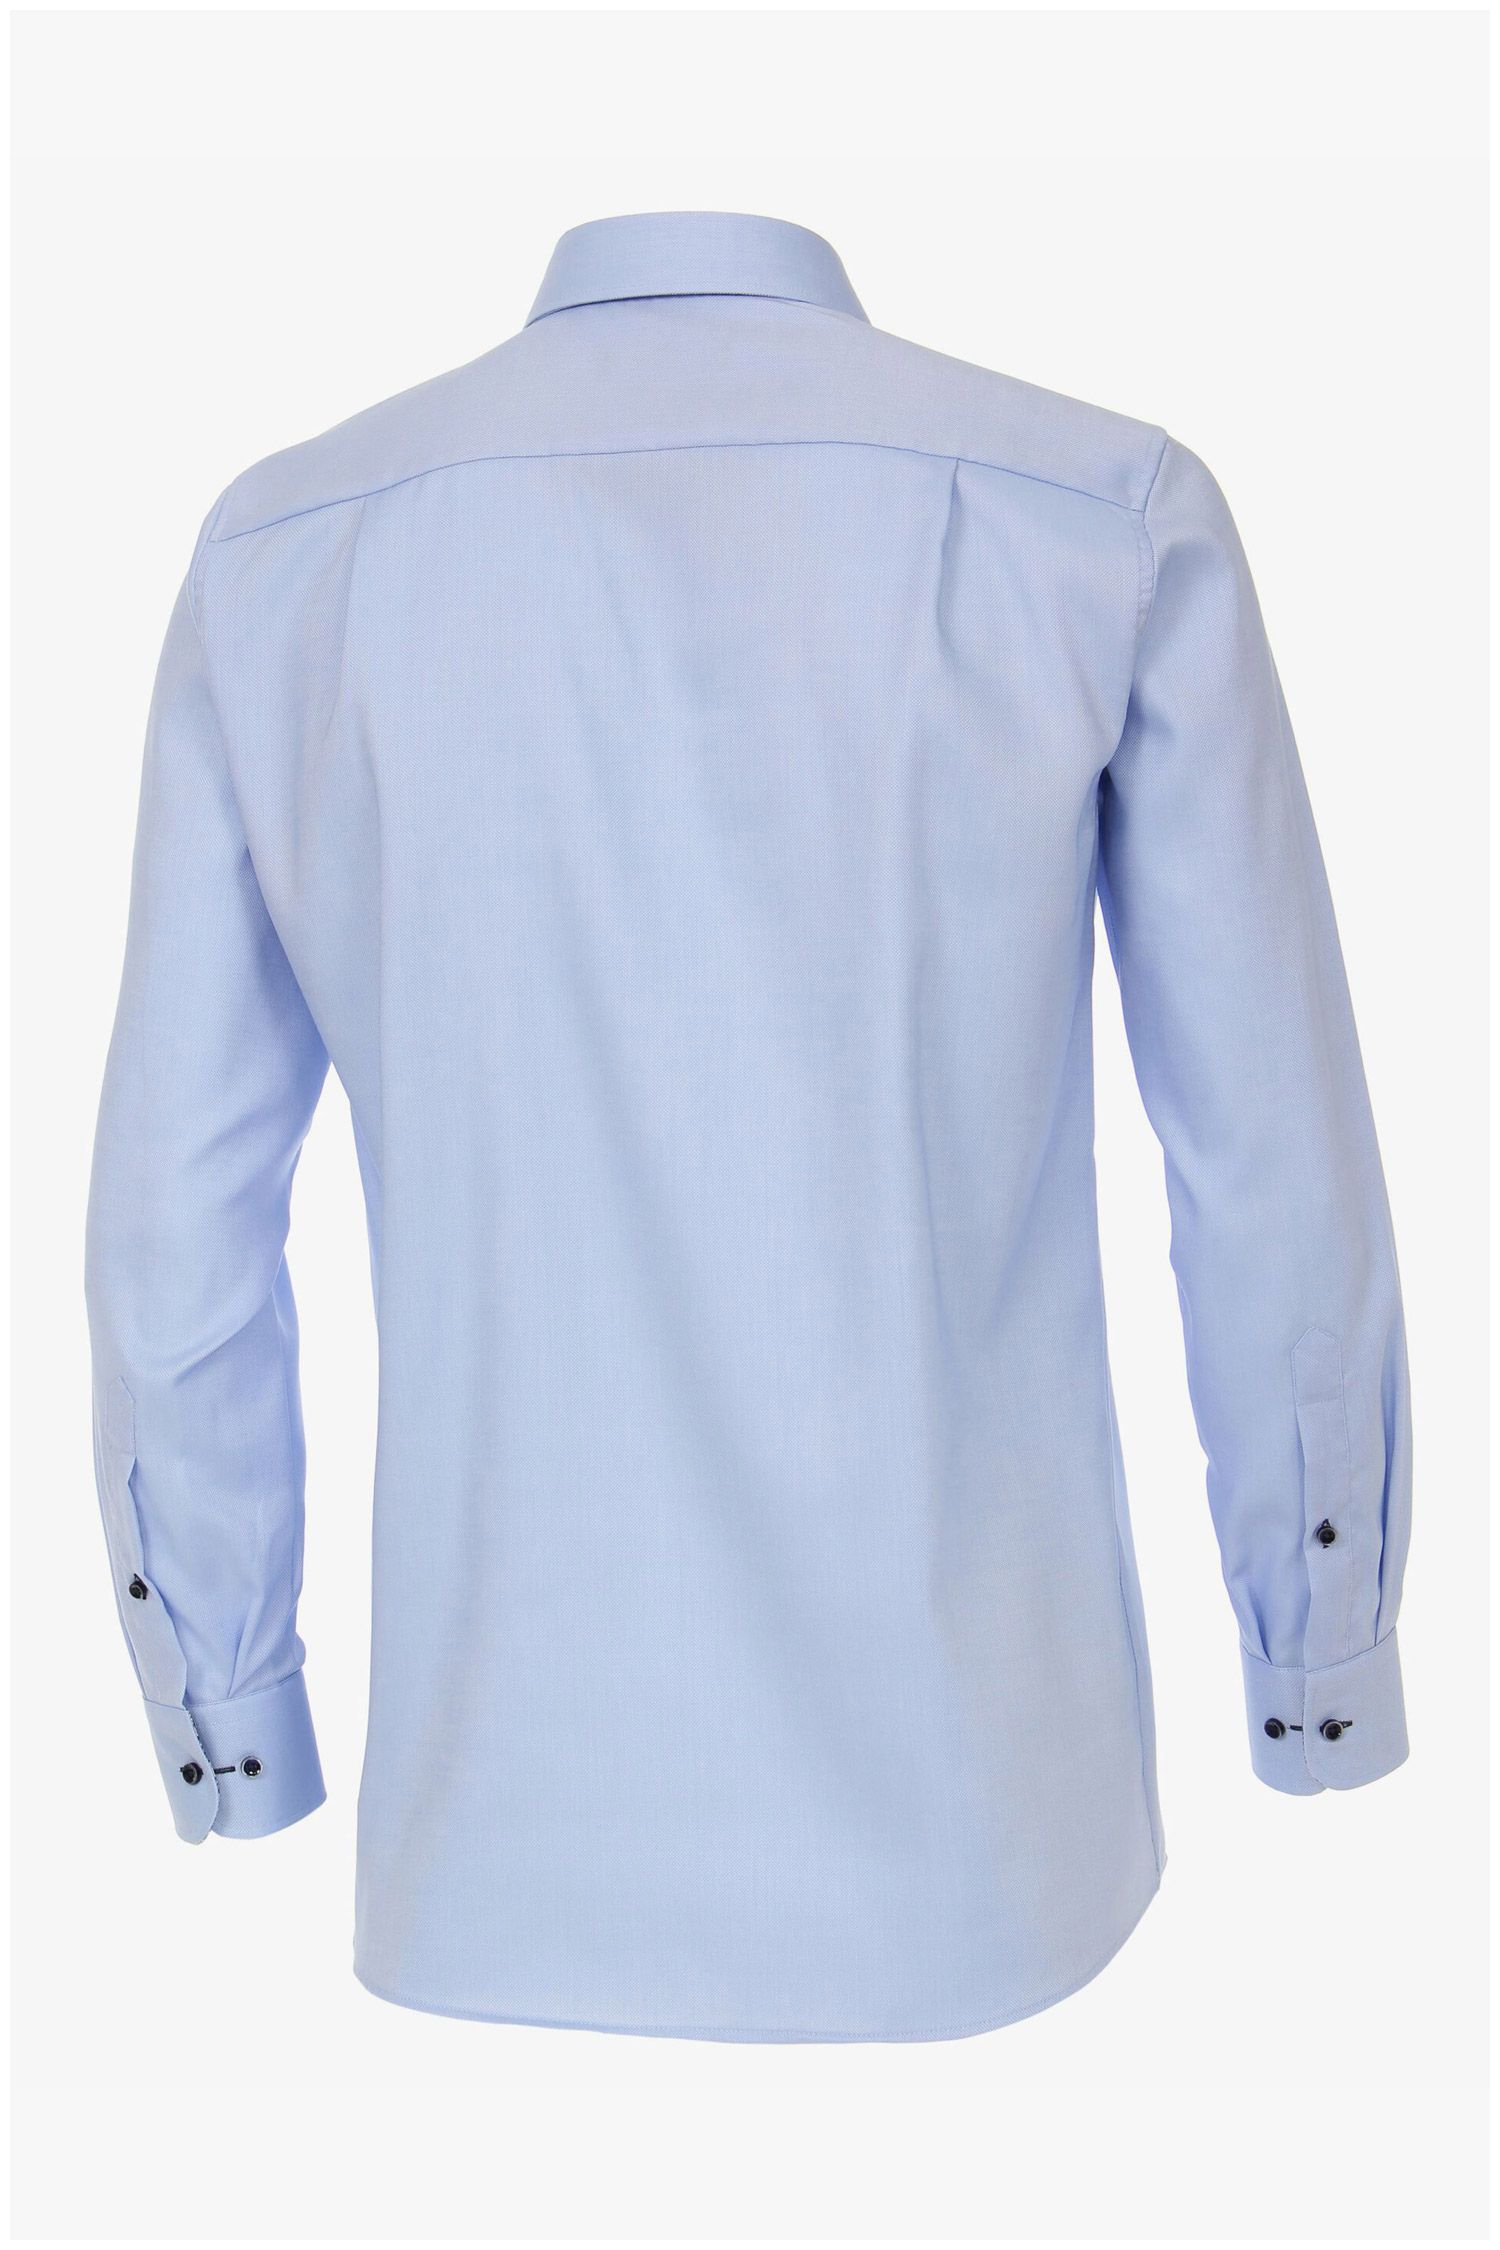 Camisas, Vestir Manga Larga, 110308, CELESTE | Zoom